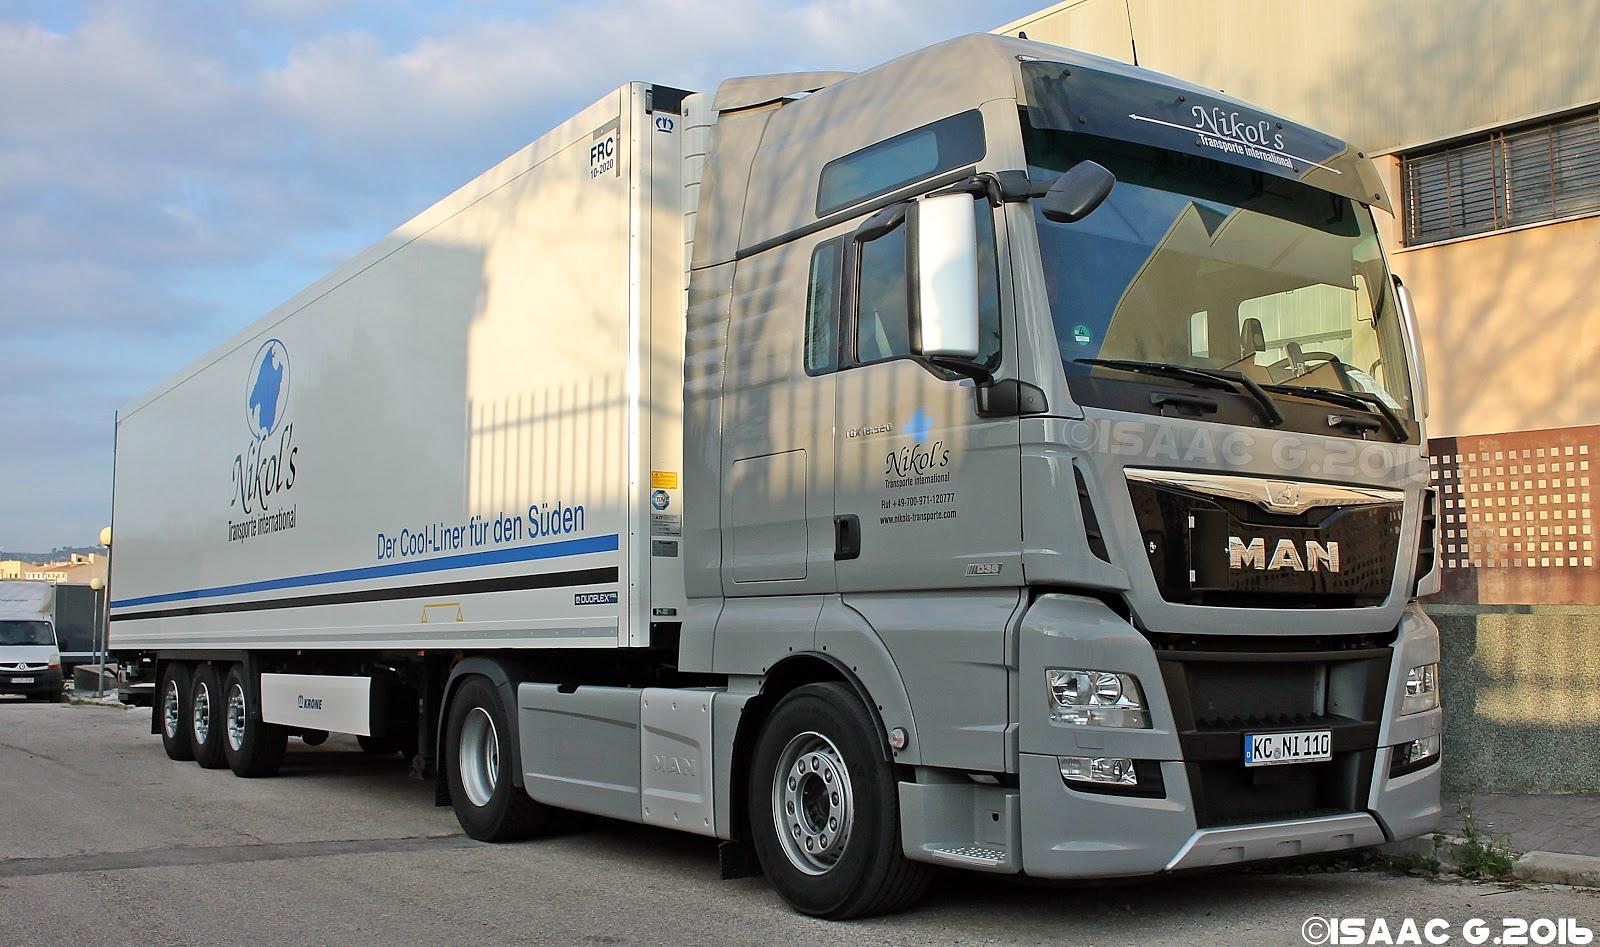 Camiones y autobuses en baleares man tgx ii - Transporte islas baleares ...